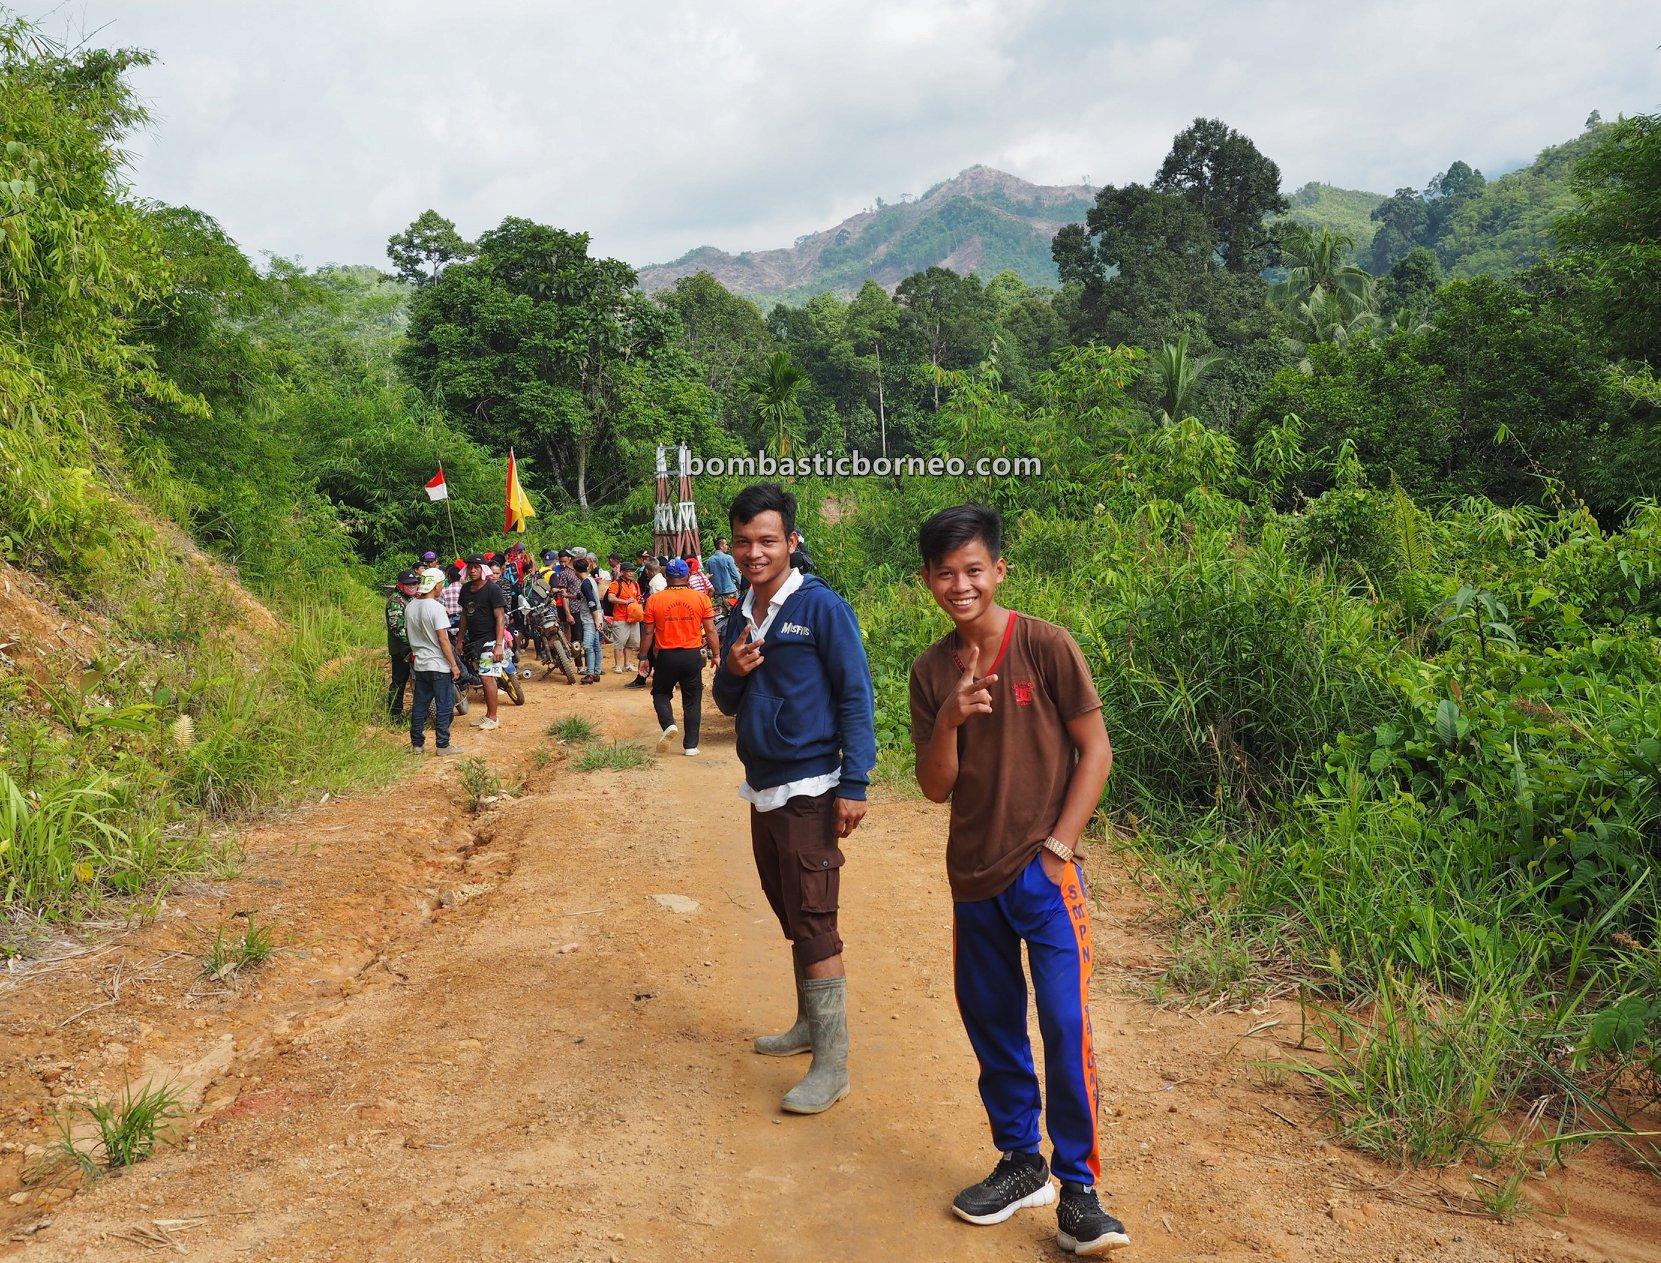 Dusun Medeng, traditional, destination, budaya, Kalimantan Barat, dayak bidayuh, native, tribe, highland, village, Tourism, travel guide, Borneo, 印尼西加里曼丹, 孟加映原住民部落,